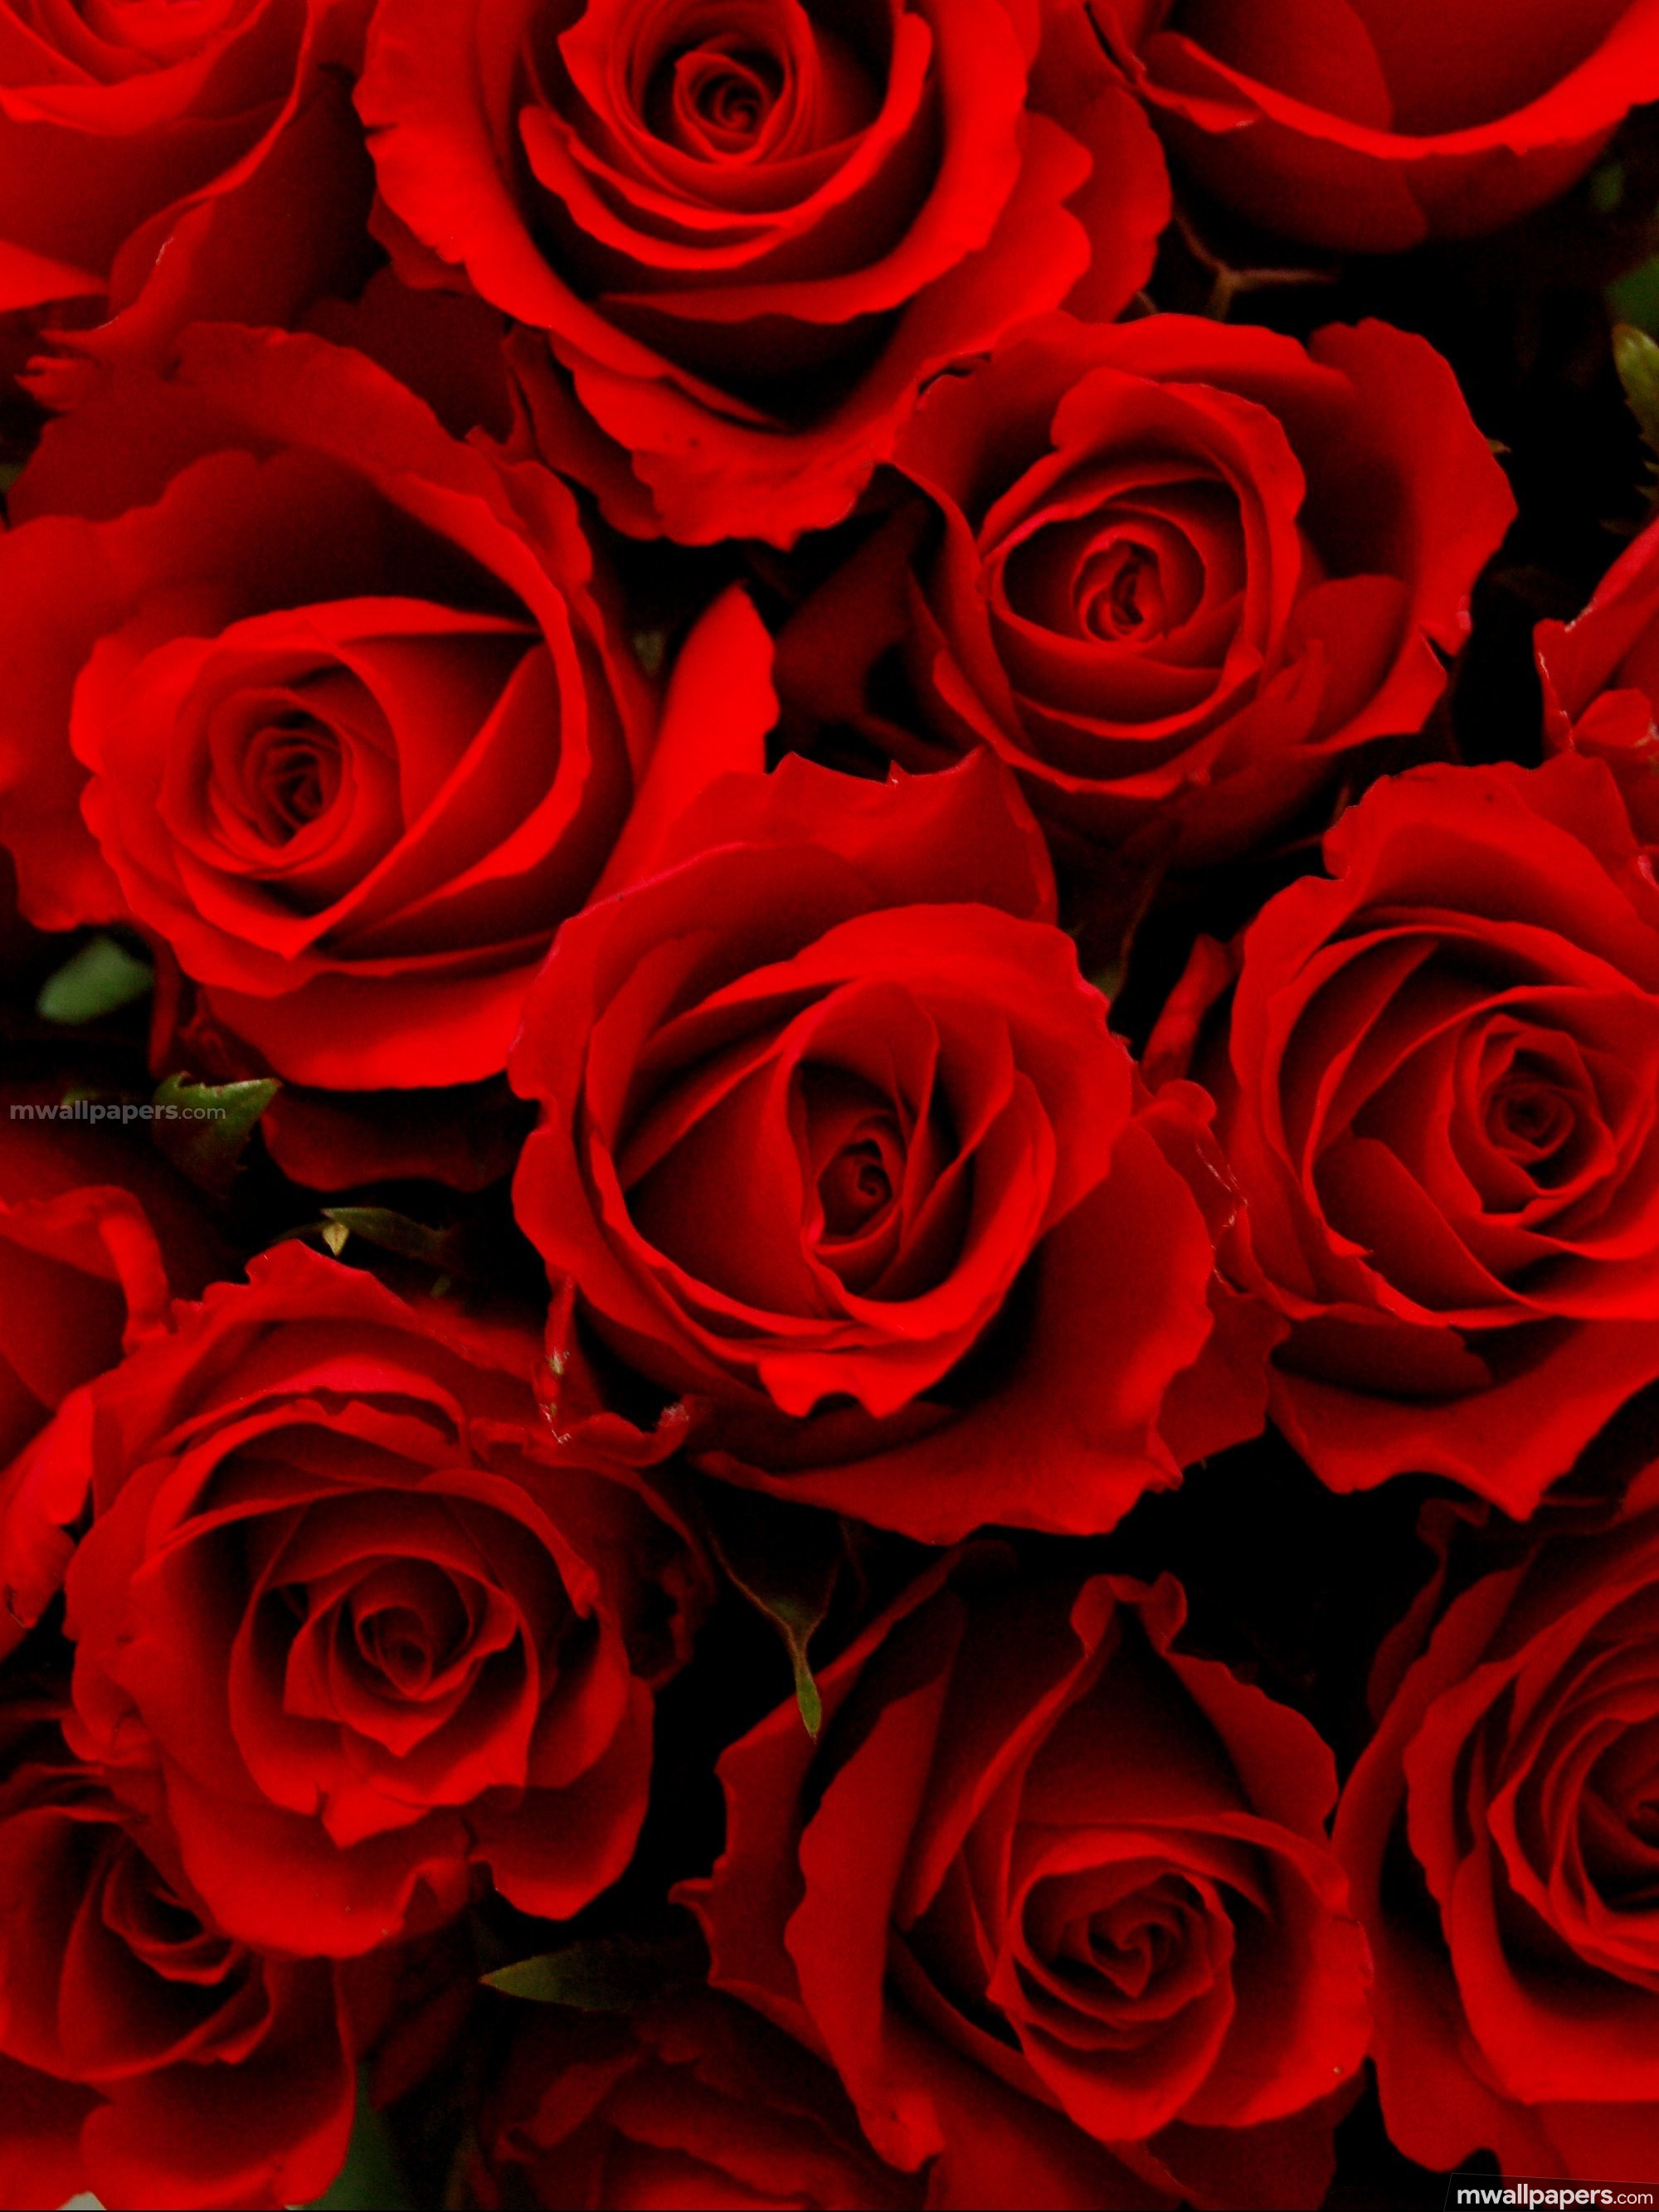 Roses Beautiful Hd Photos - Blue Rose Hd Image Downlood , HD Wallpaper & Backgrounds